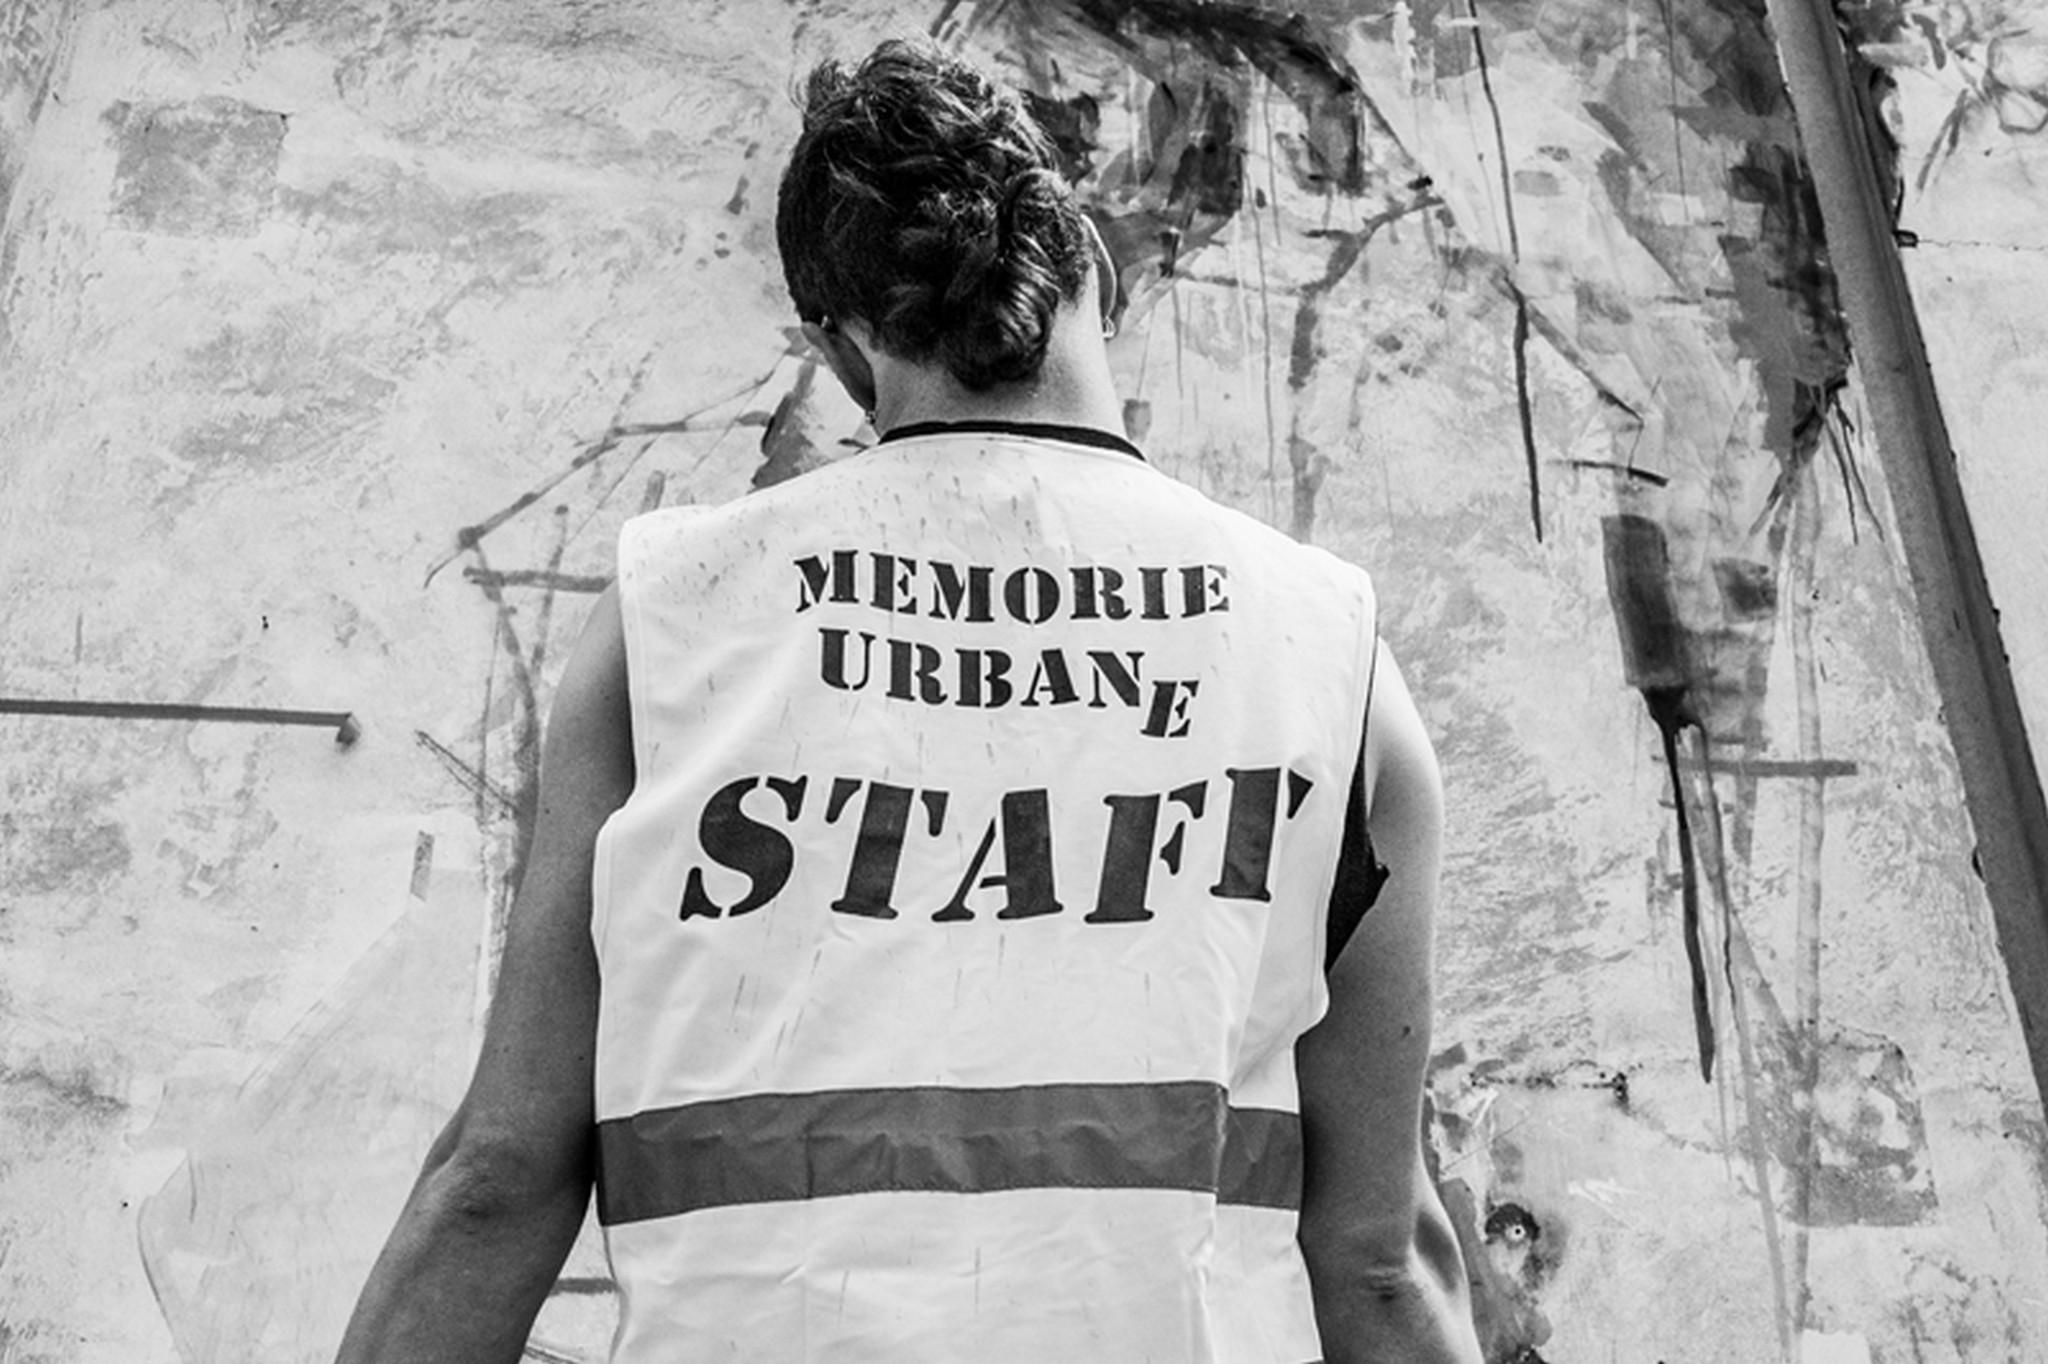 Flavia_Fiengo_memorie urbane00063